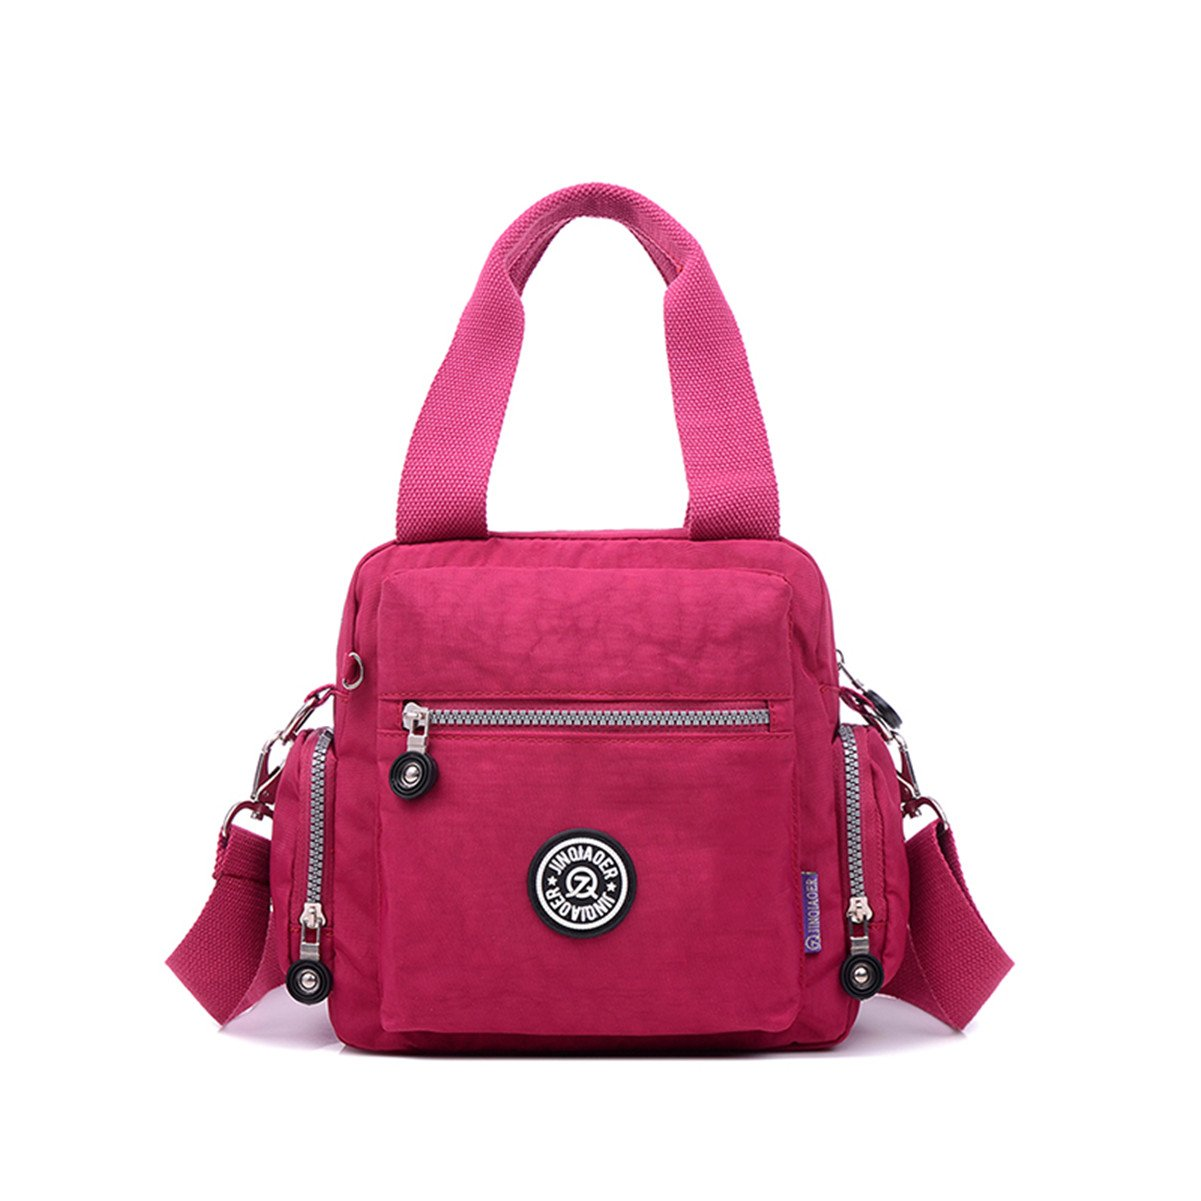 Tiny Chou Waterproof Nylon Top-handle Handbag Crossbody Messenger Bag with Detachable Shoulder Strap-Red